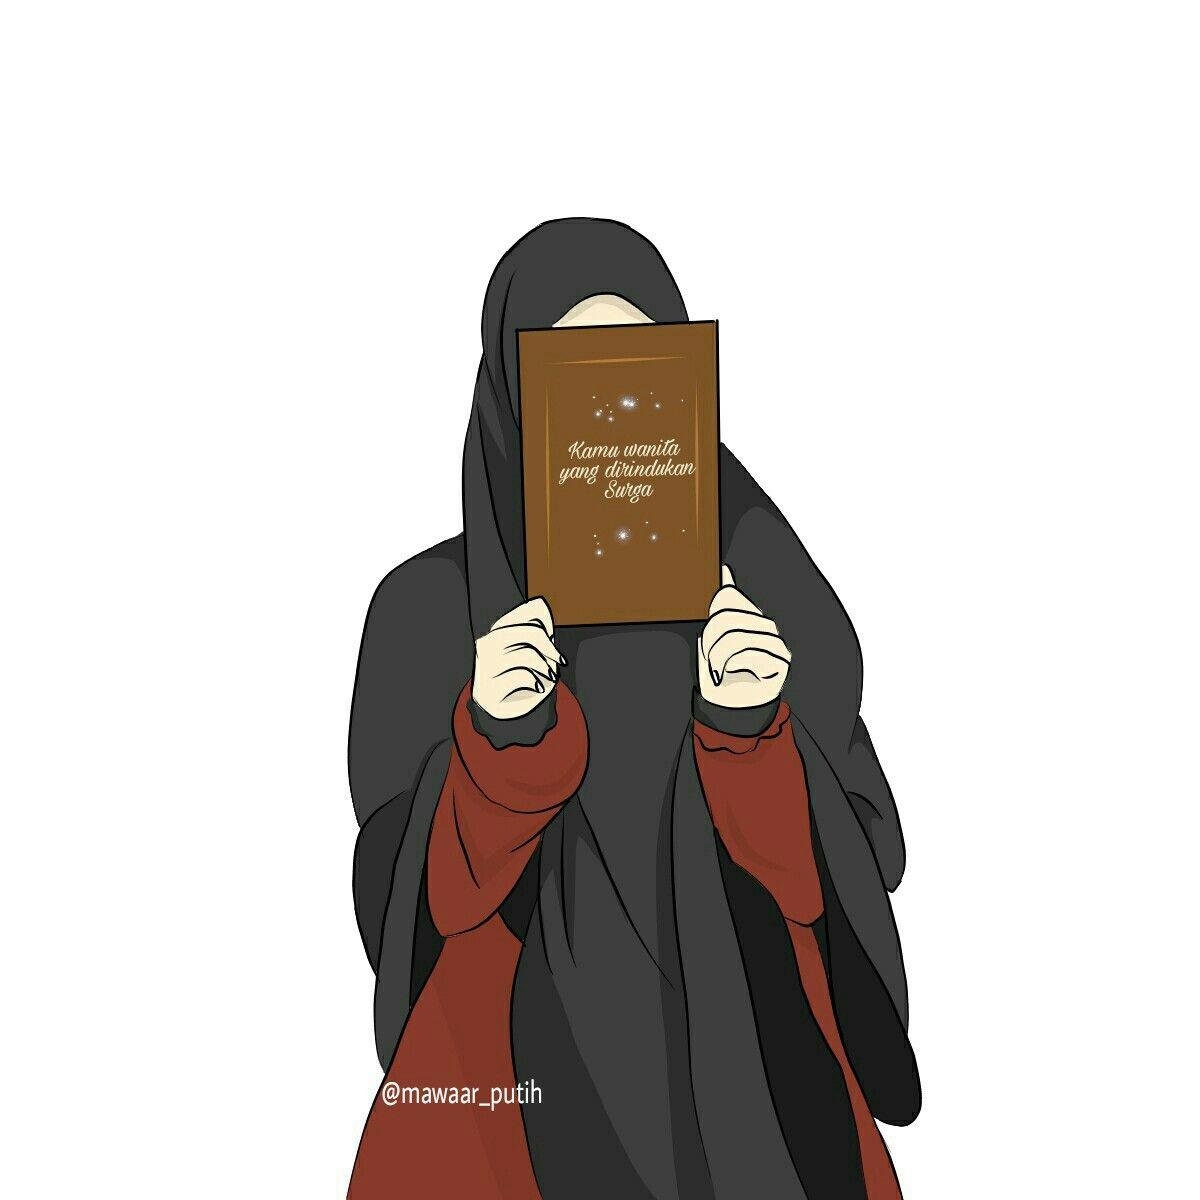 I Love Hijab Hfz Kartun Gambar Animasi